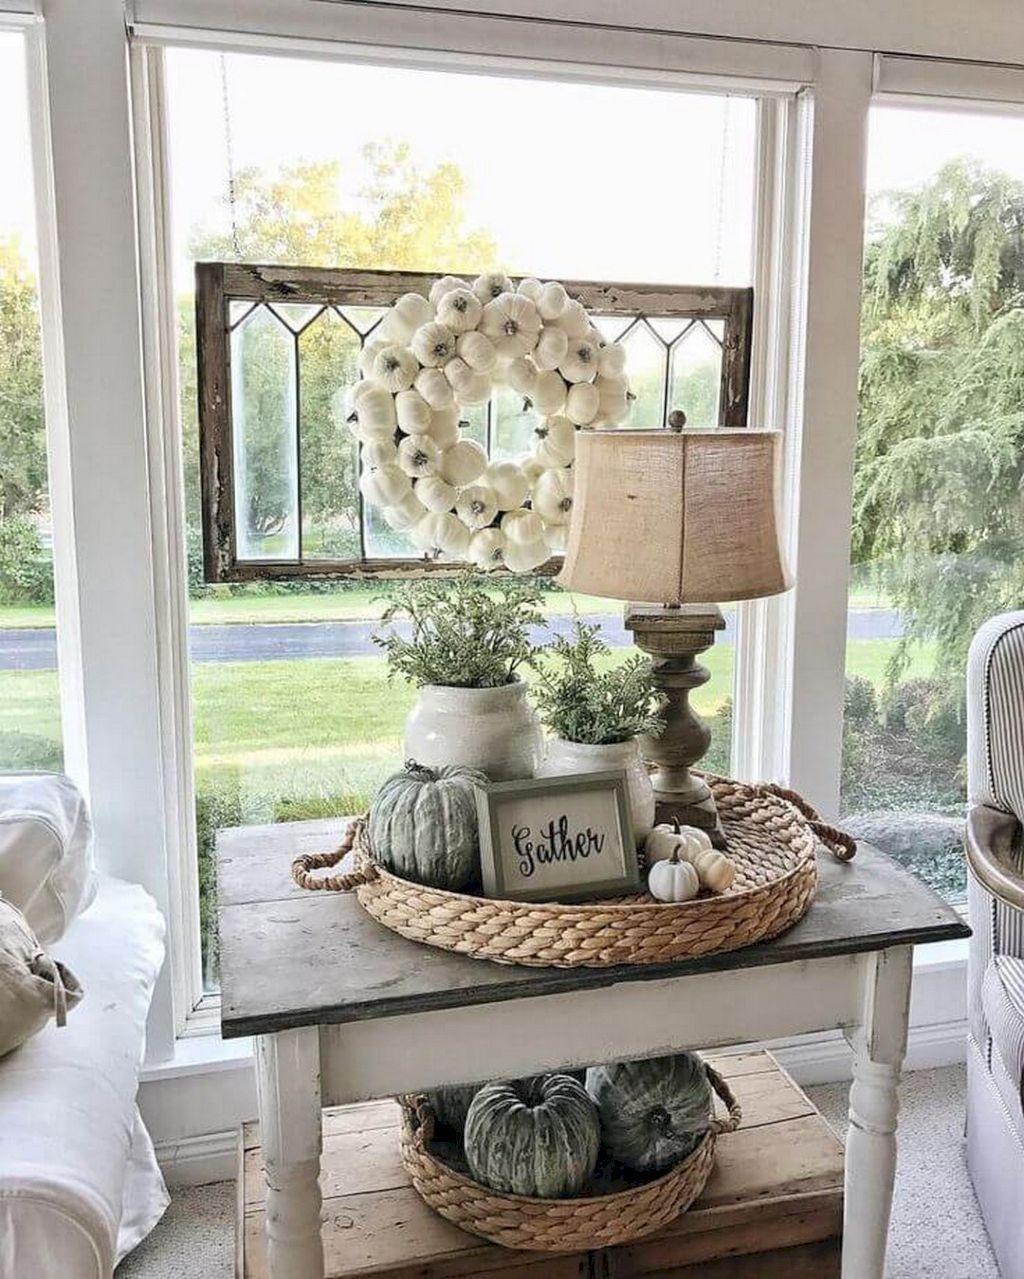 Cute idea using a wicker basket tray for decoration.